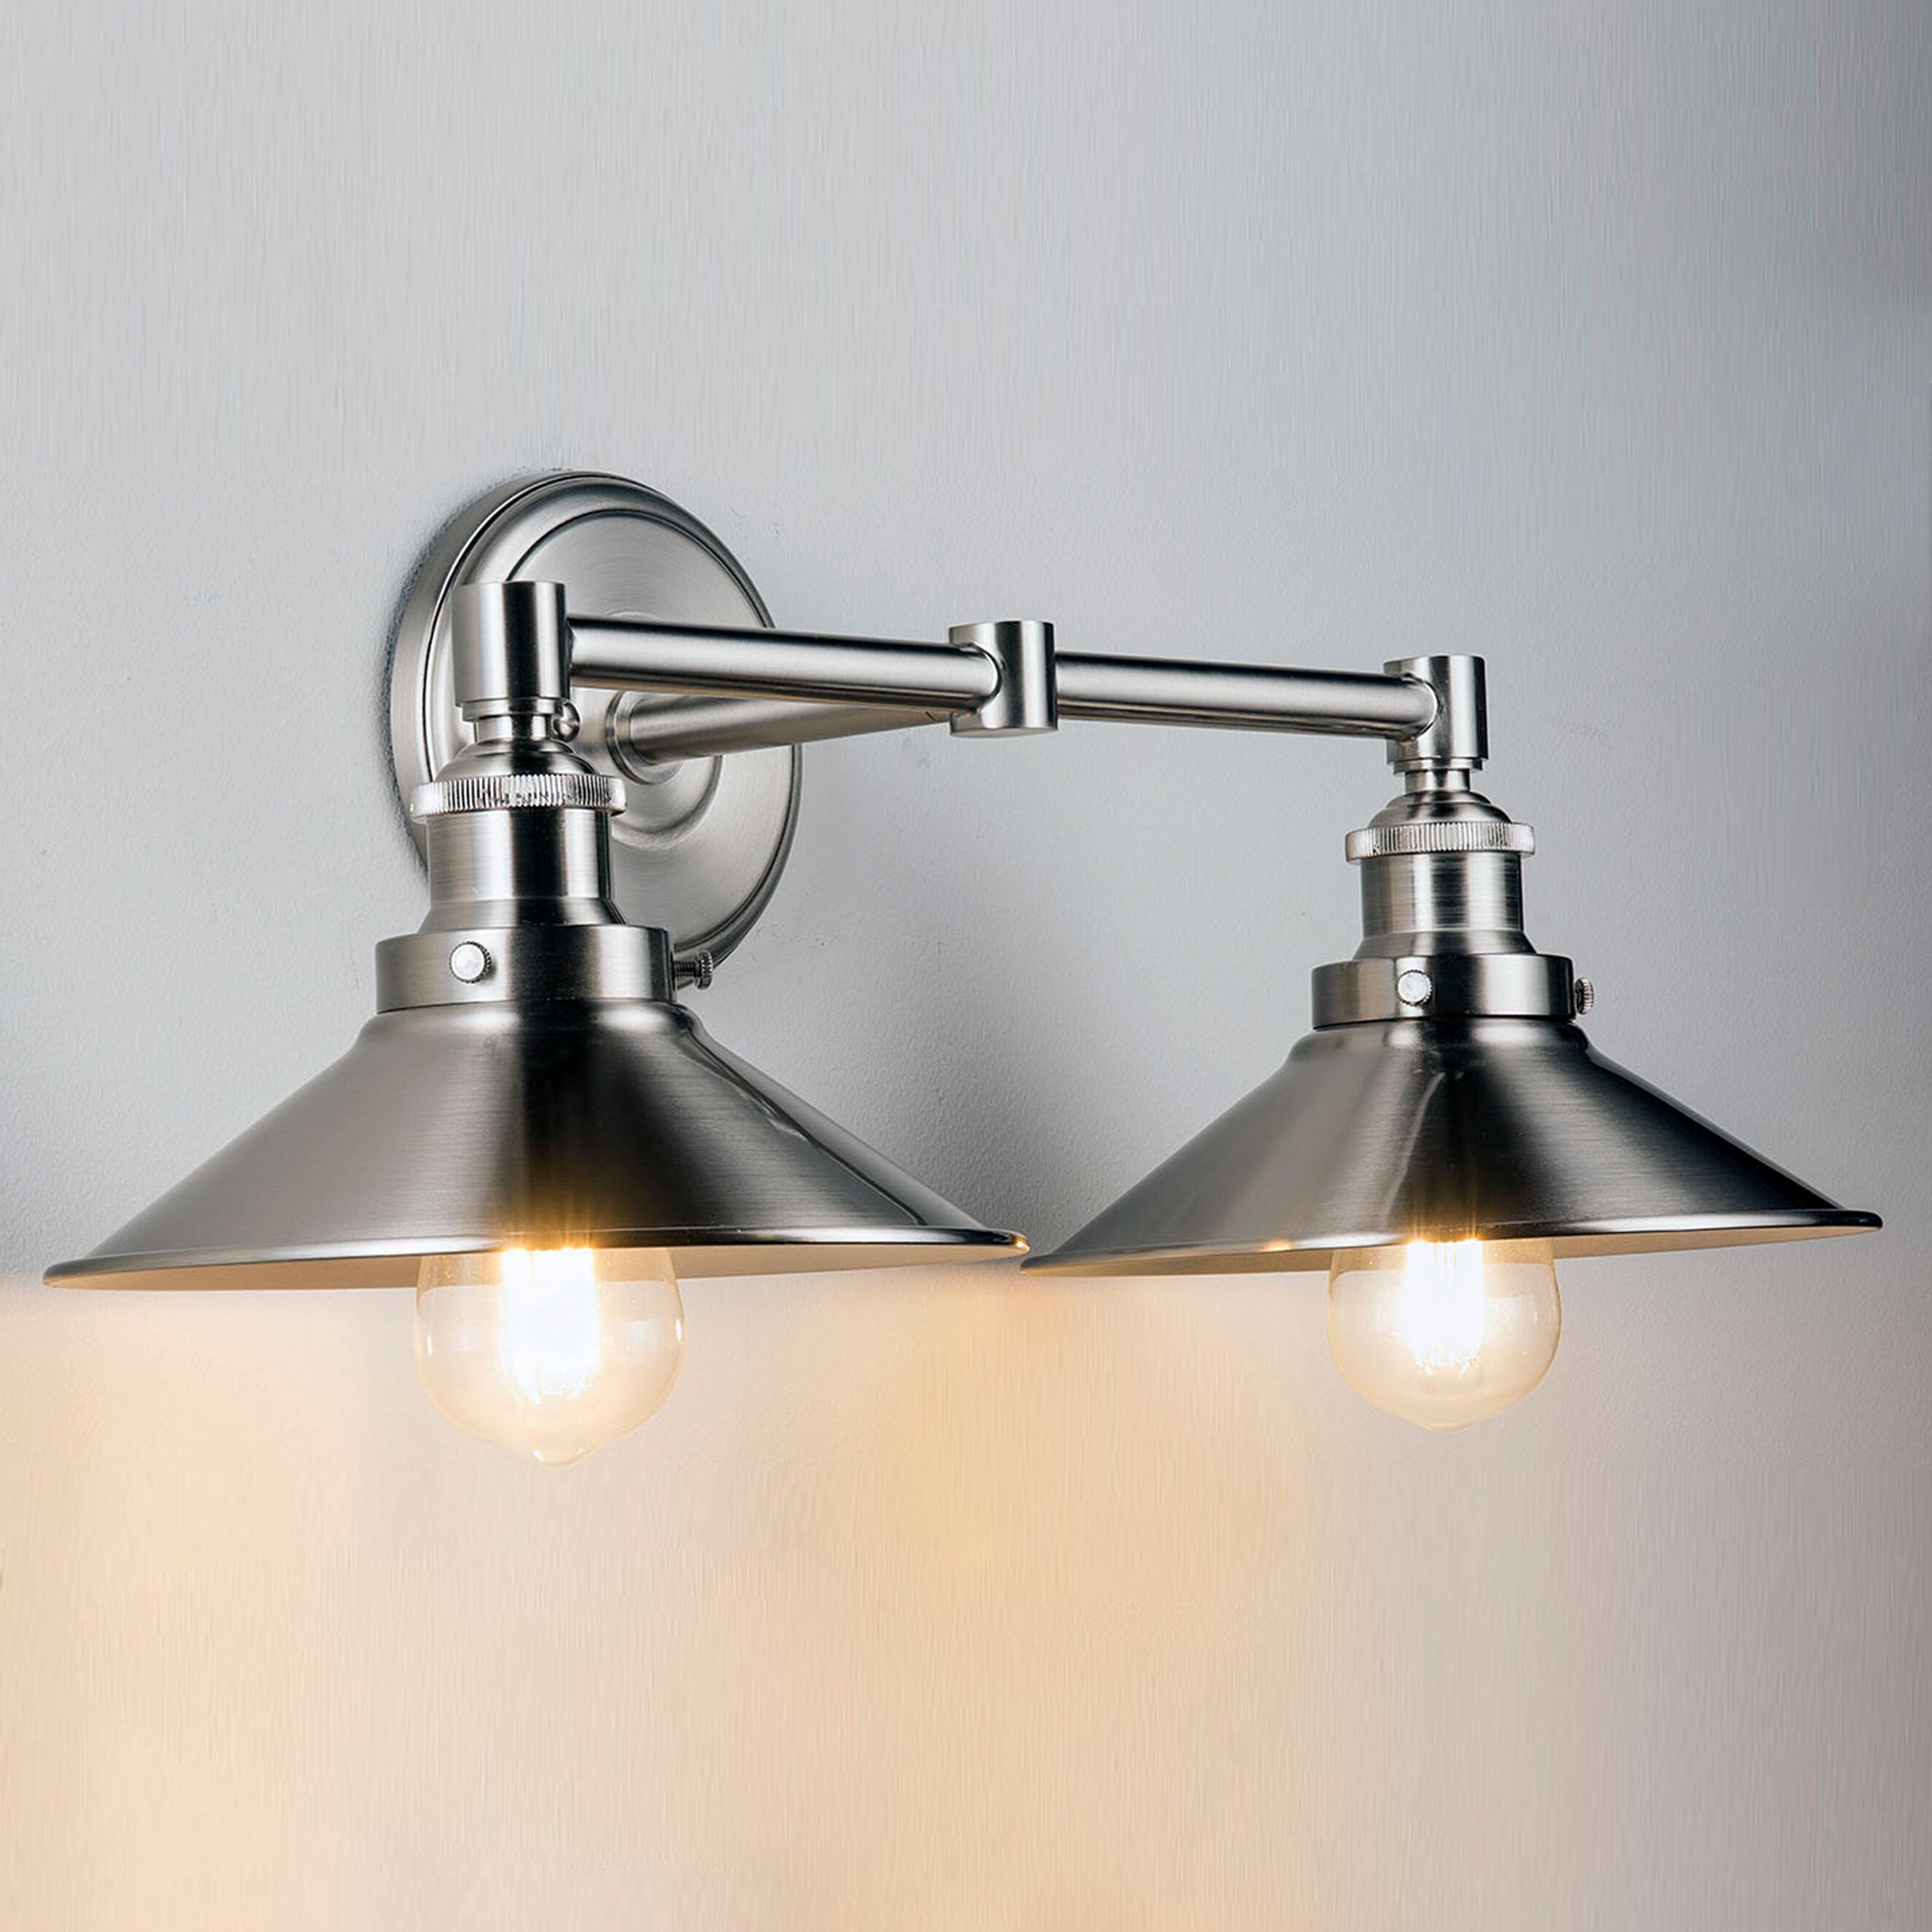 Trent Austin Design Acquah 2 Light Dimmable Vanity Light Reviews Wayfair Ca